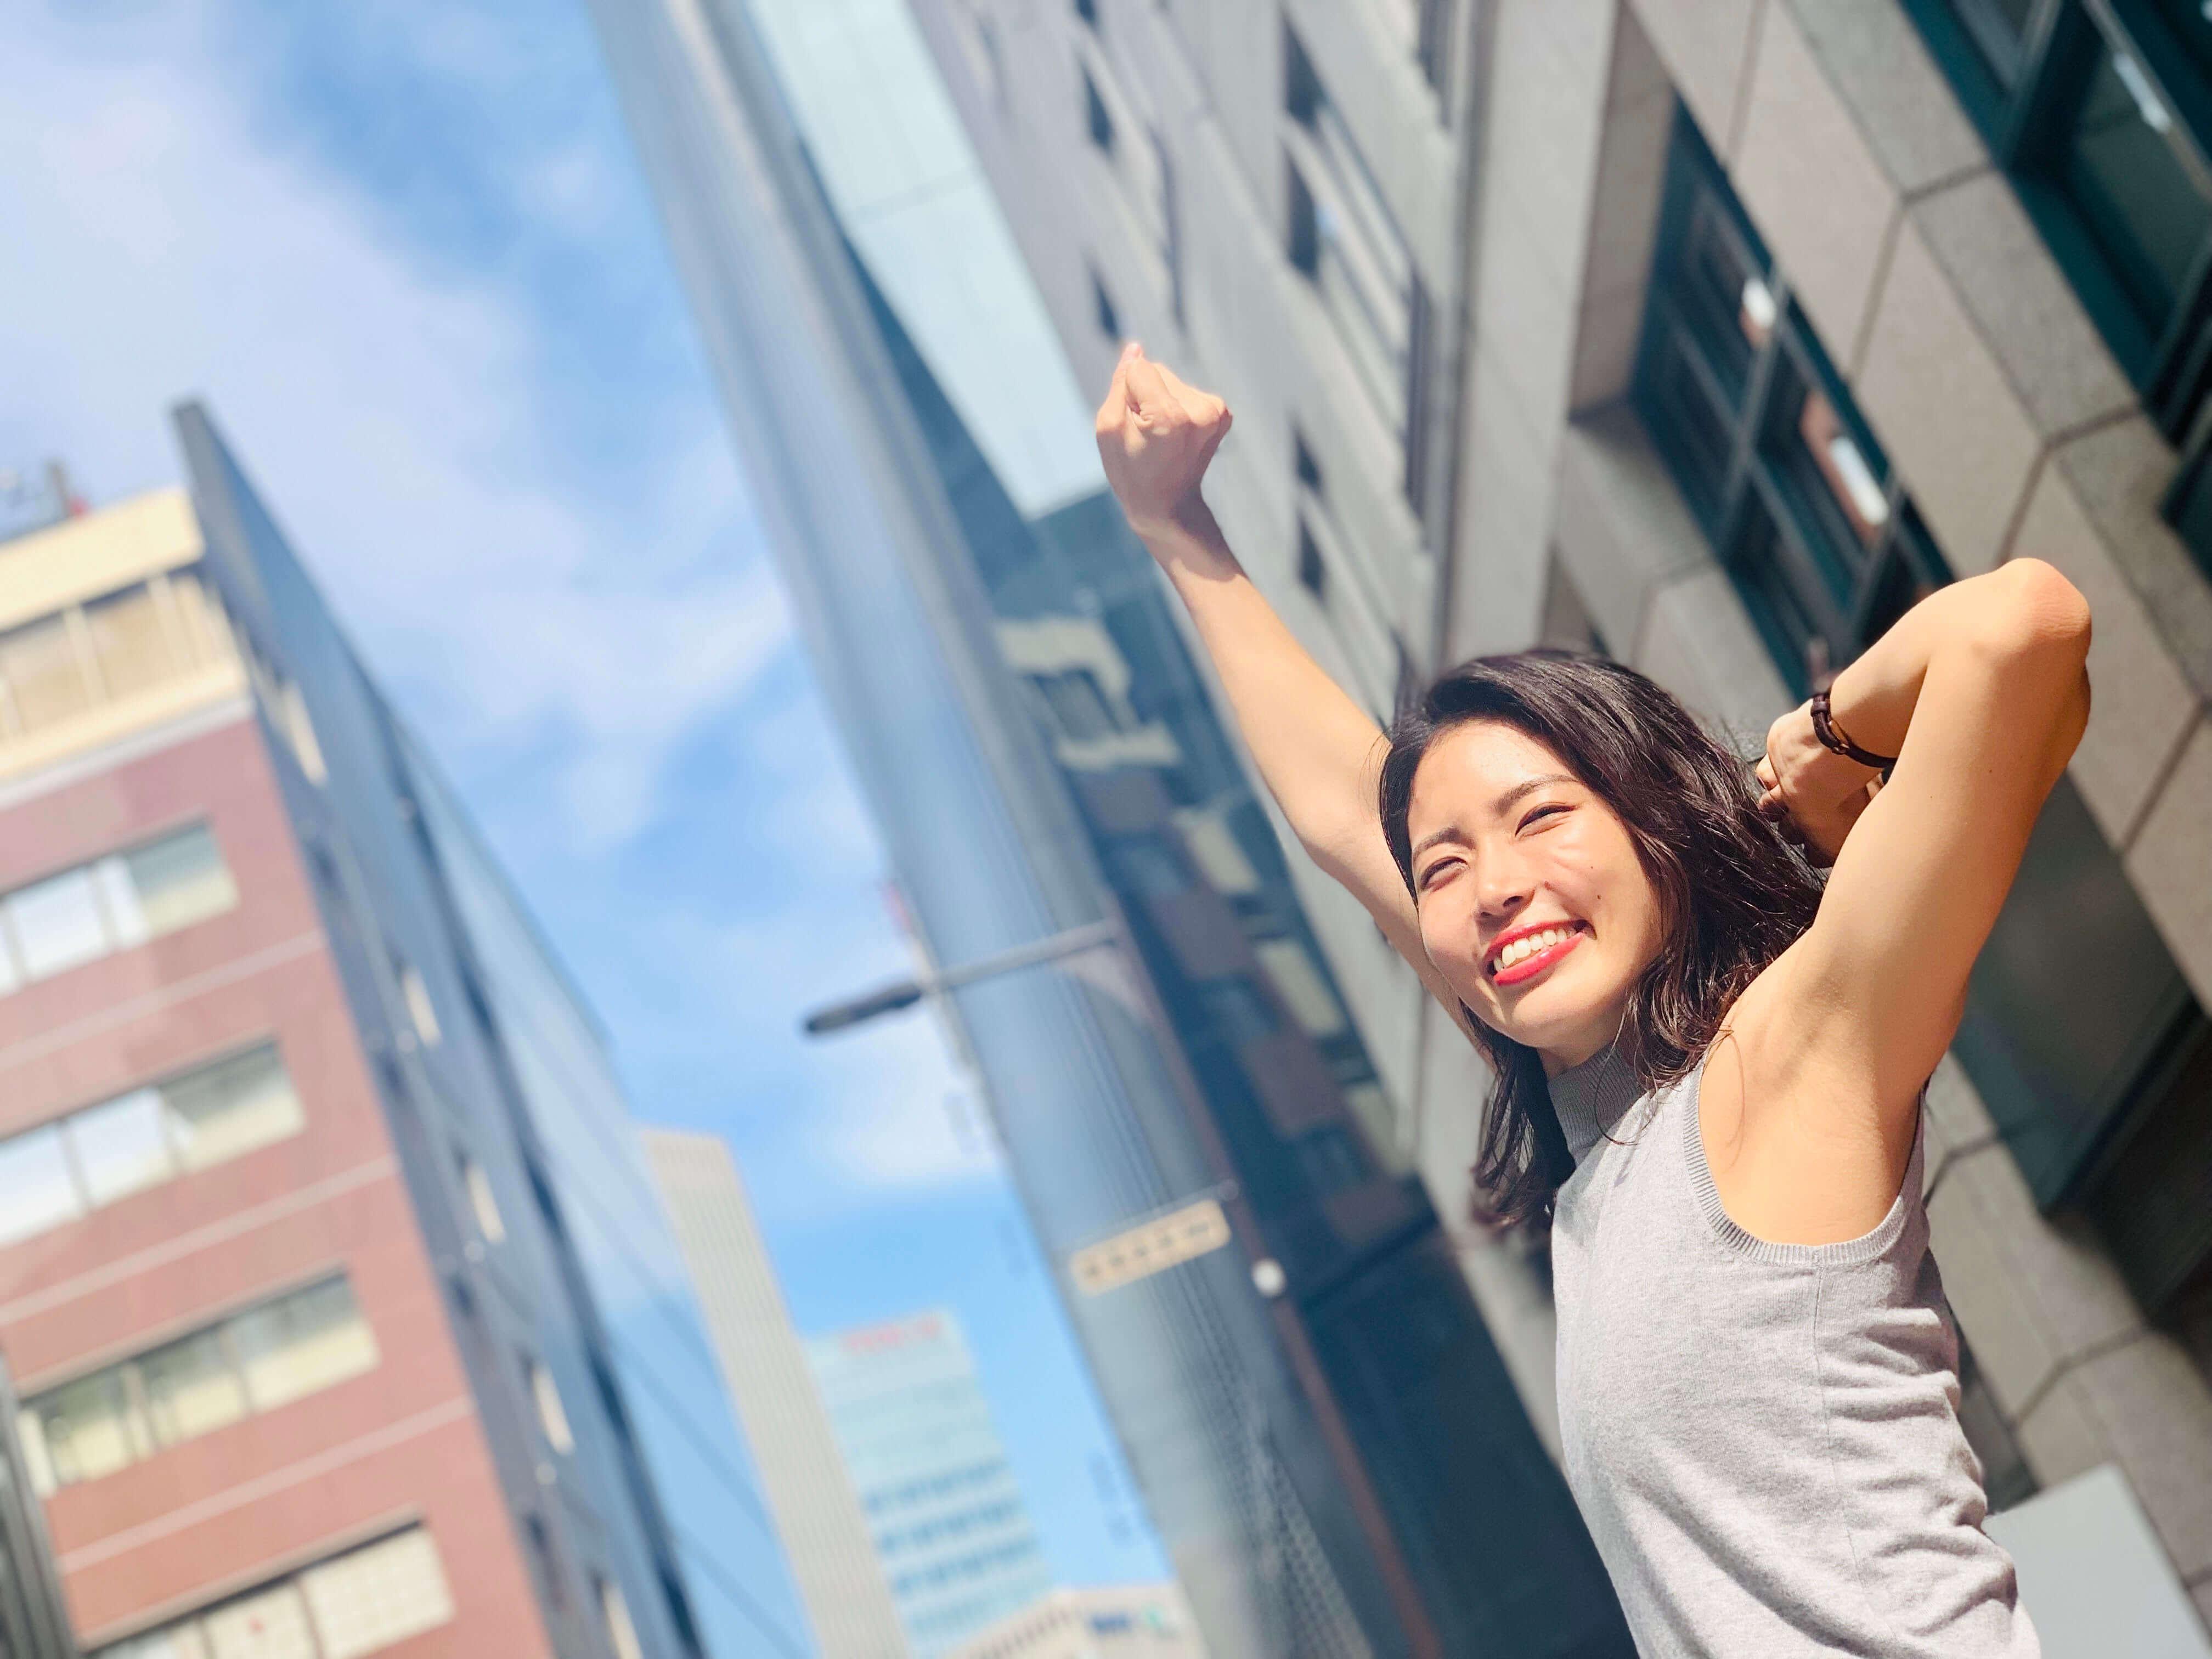 Mindfulnessと仕事のパフォーマンスの関係性